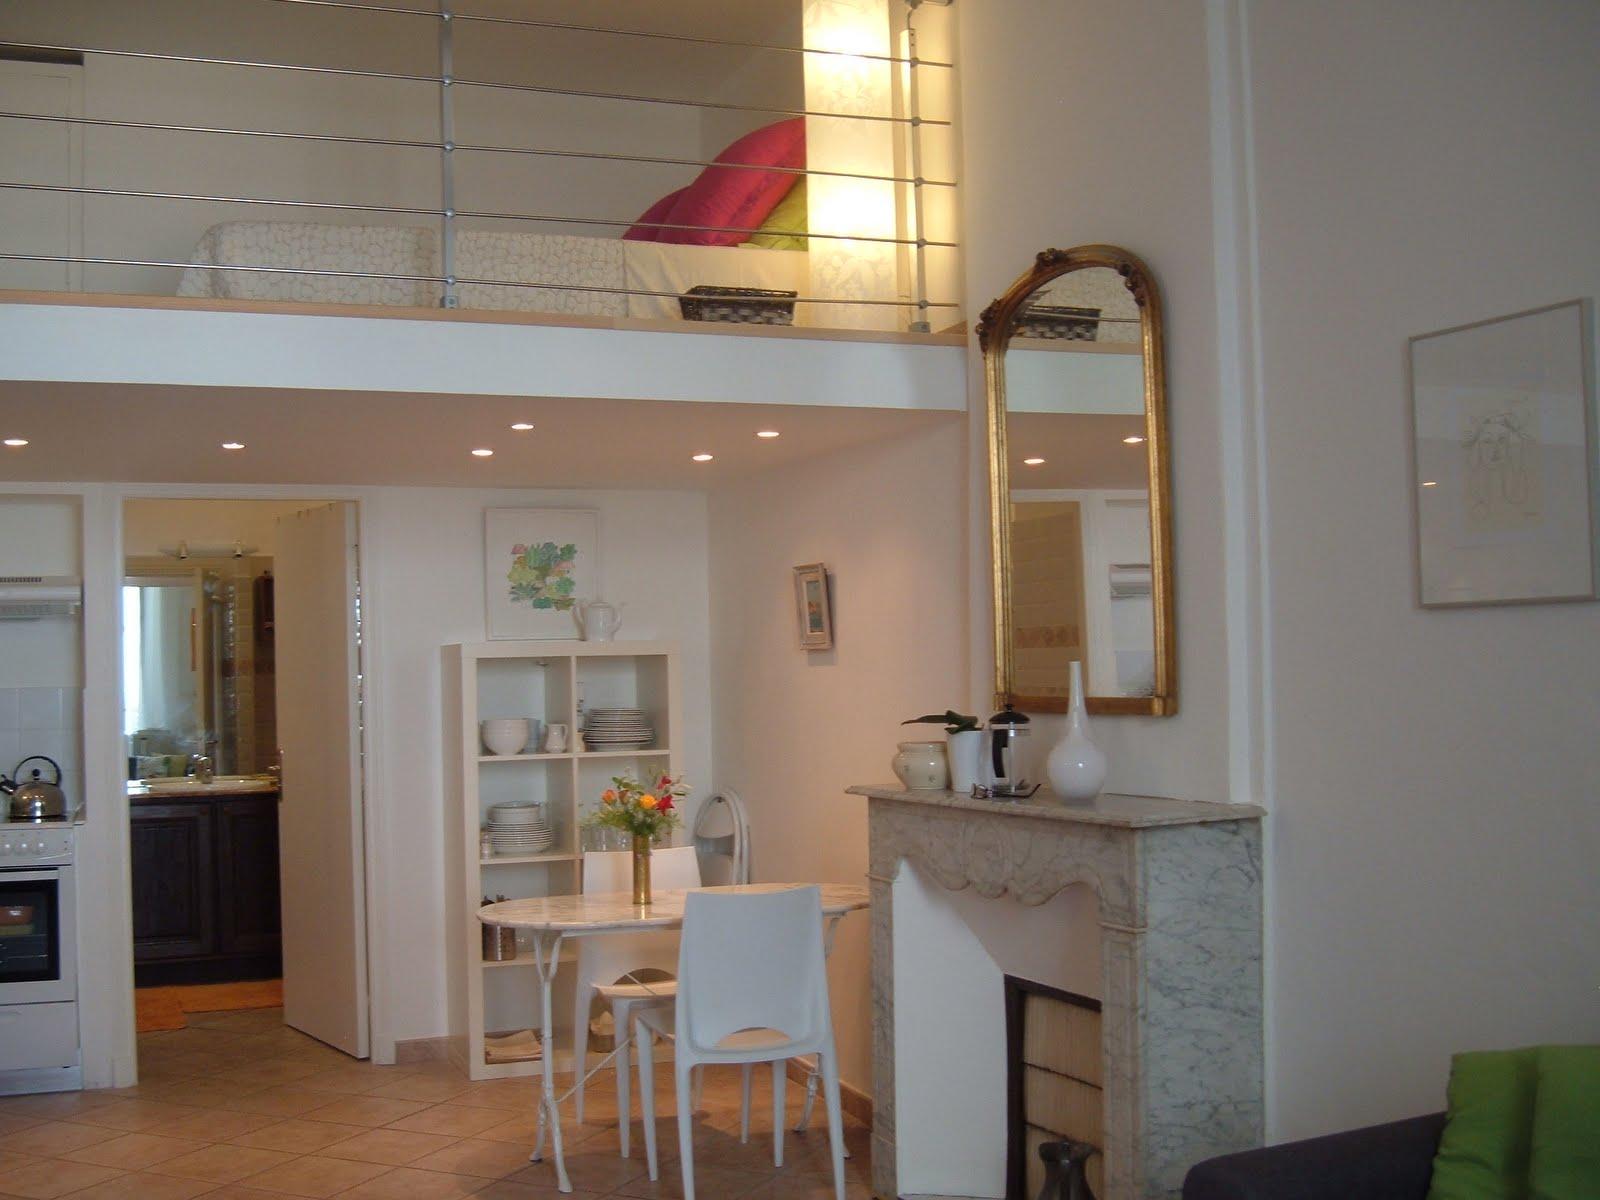 Vivre antibes studio vacances antibes - Construire une mezzanine suspendue ...